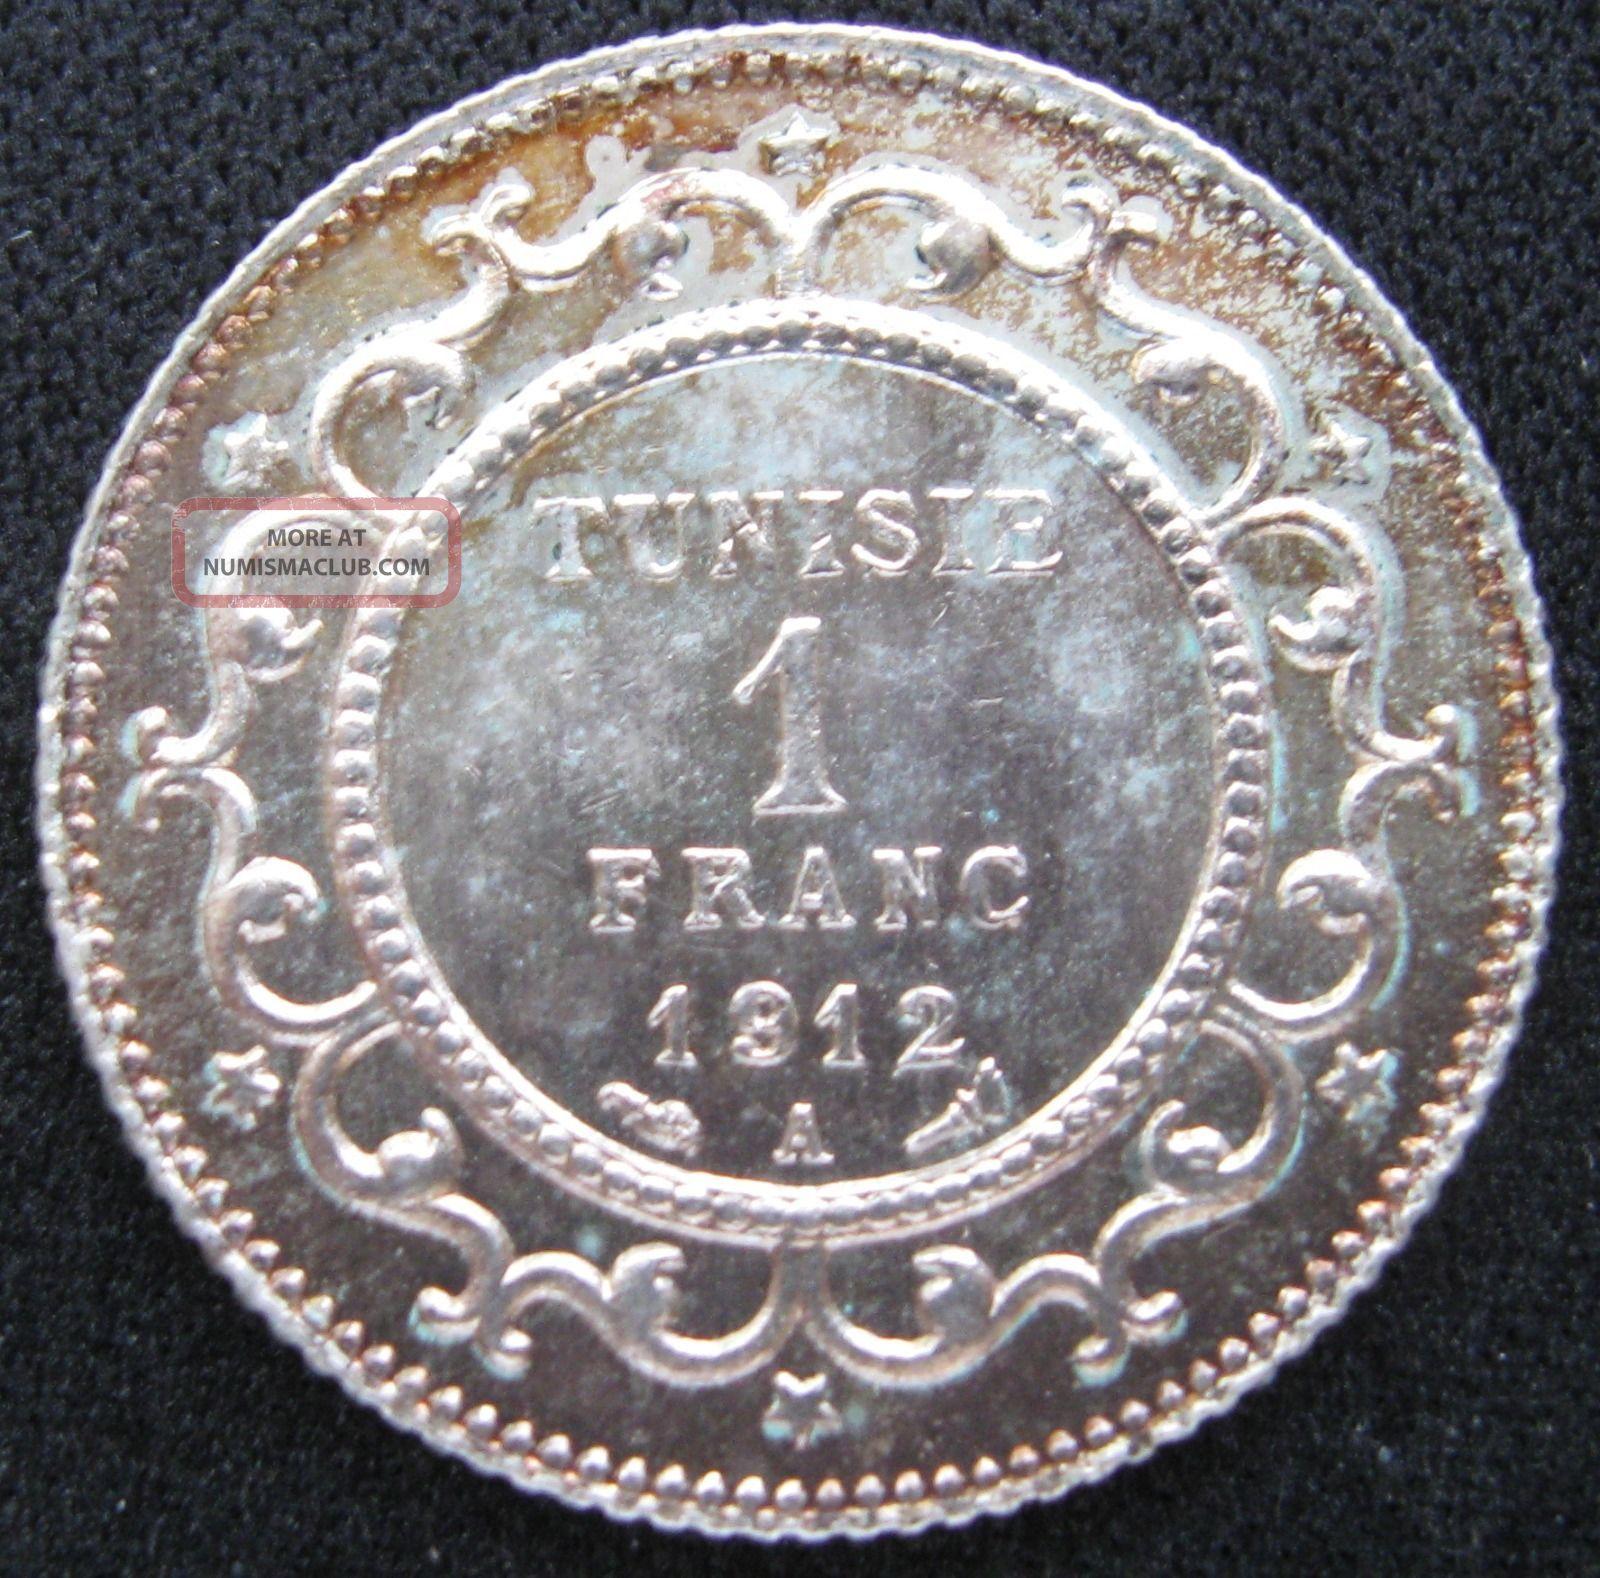 Tunisia Under France 1 Franc 1912 Sharp Bu